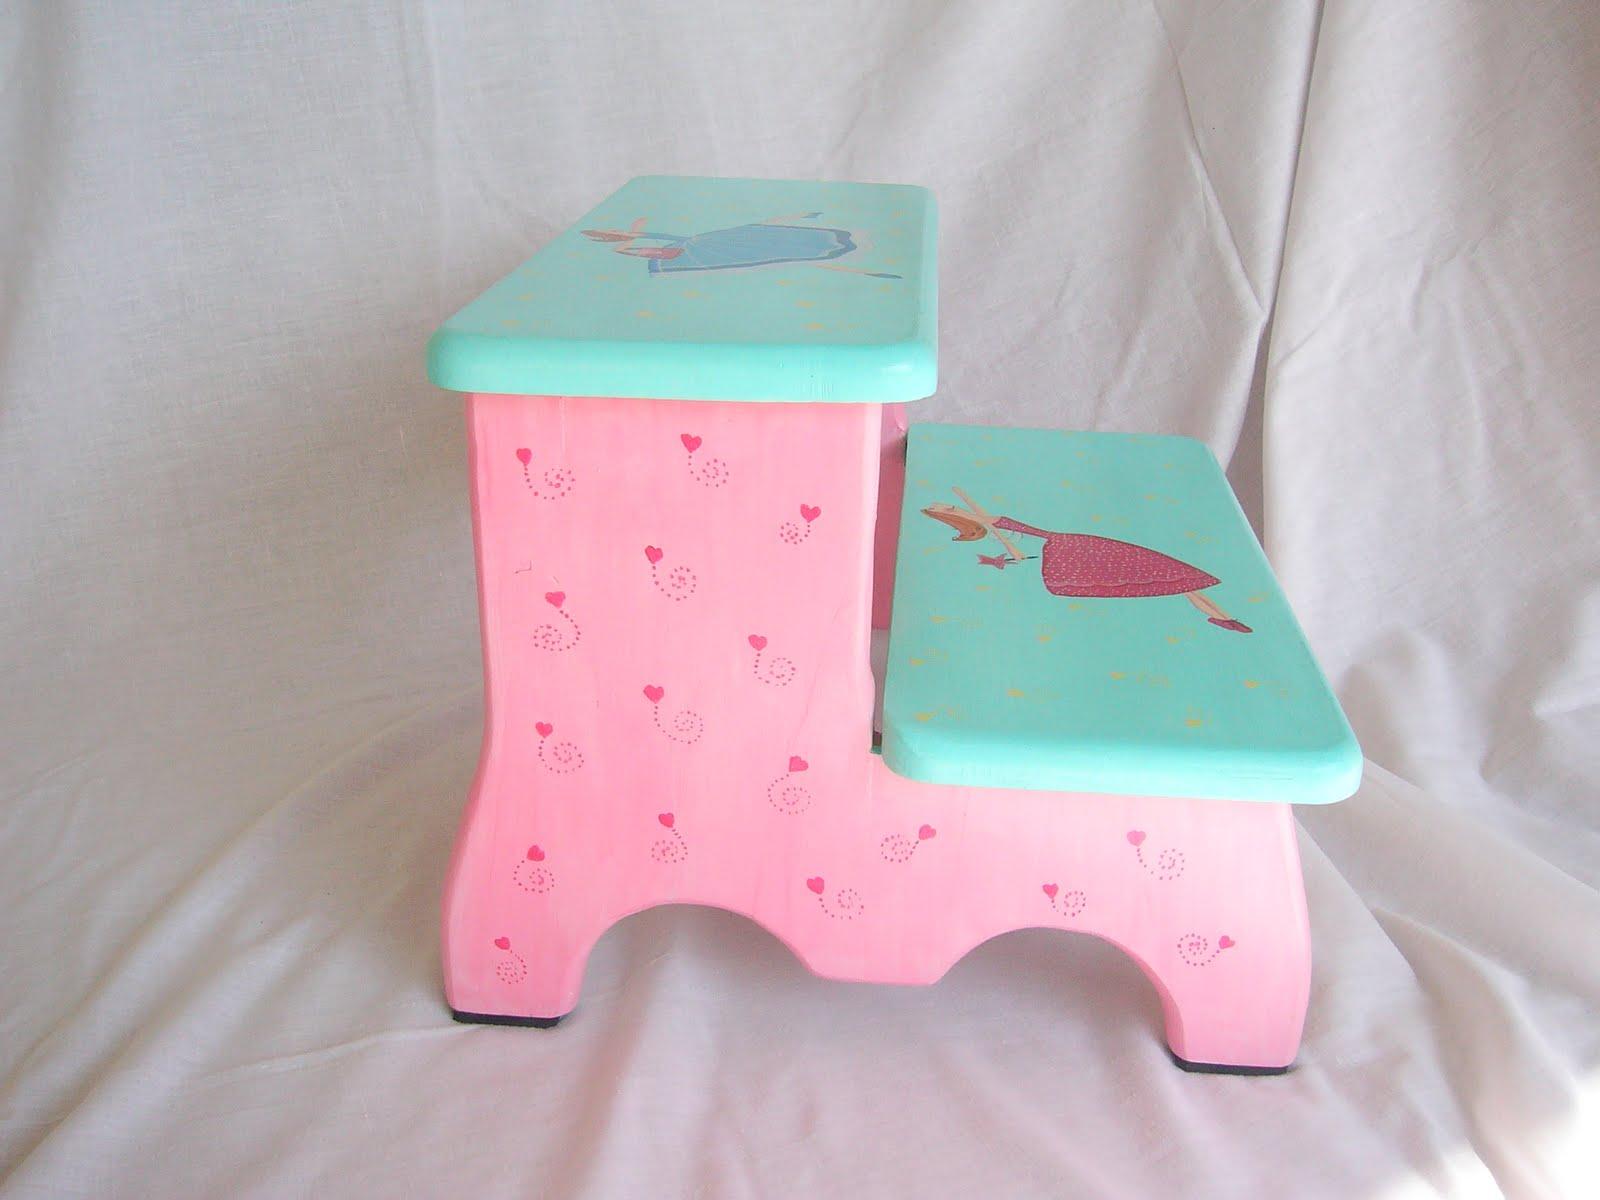 Muebles infantiles decoraci n para ni os juguetes tejidos manualidades cocina etc - Manualidades cocina para ninos ...